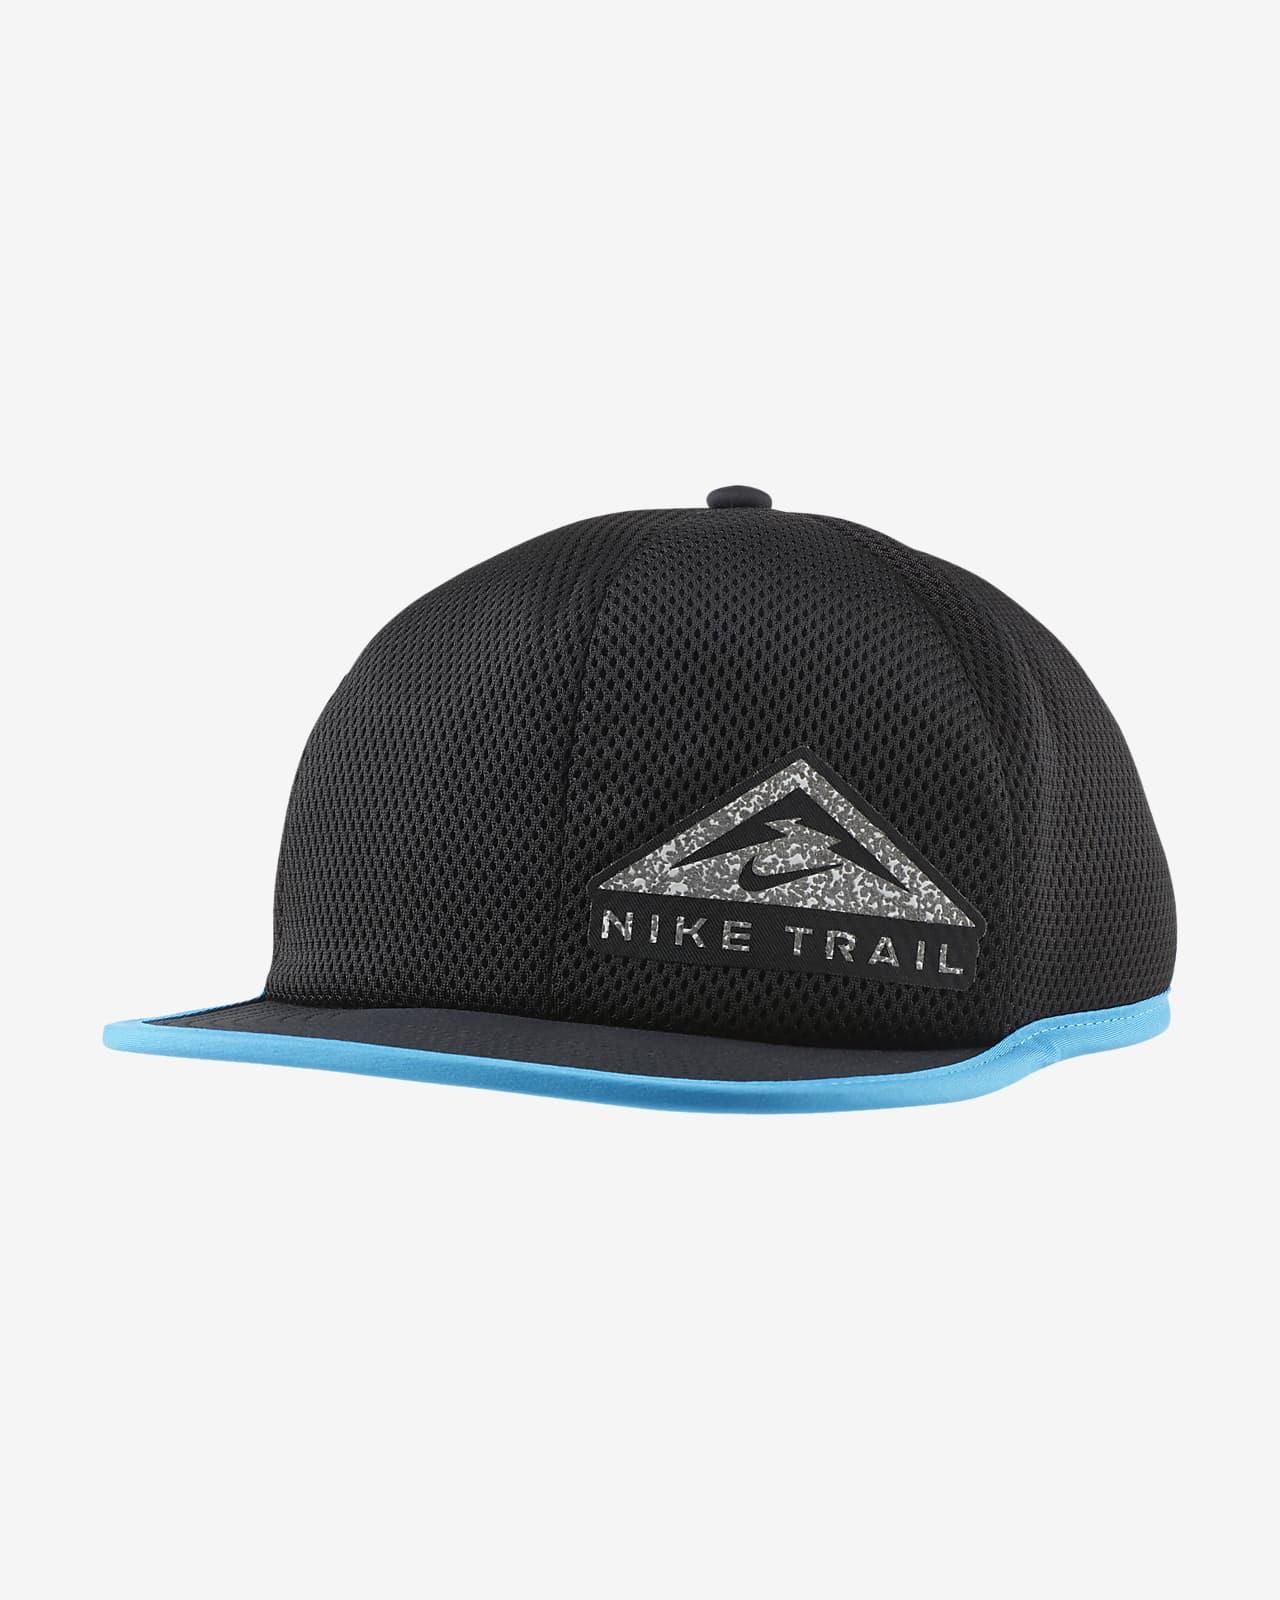 Nike Dri-FIT Pro terrengløpecaps